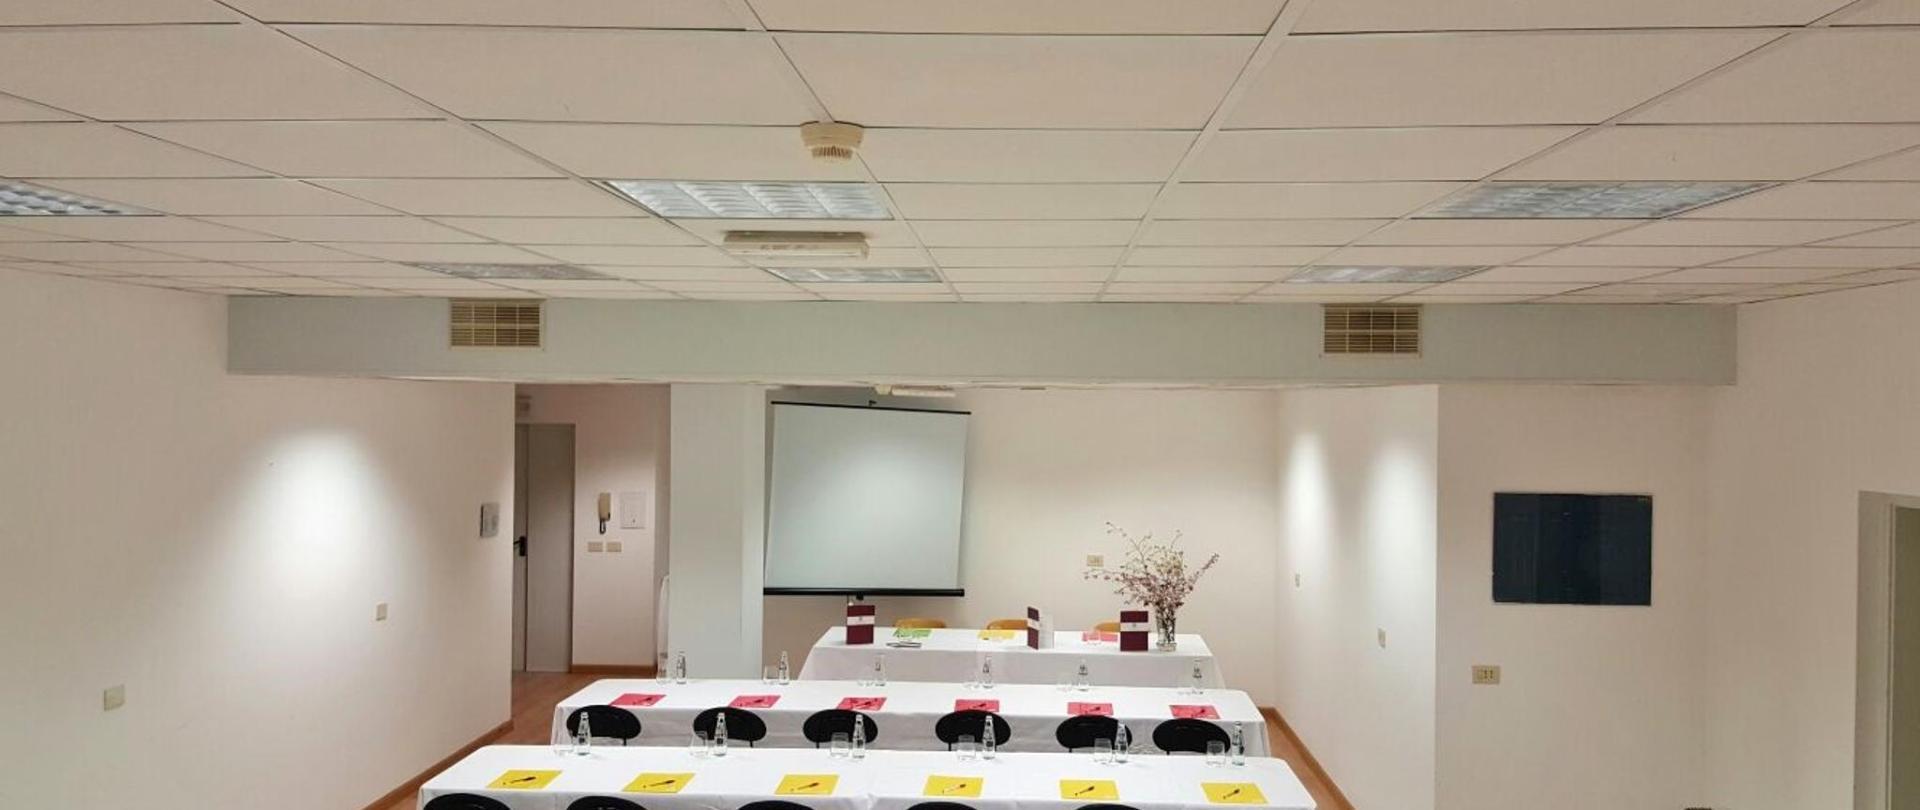 sala riunioni banchi scuola 3.jpg